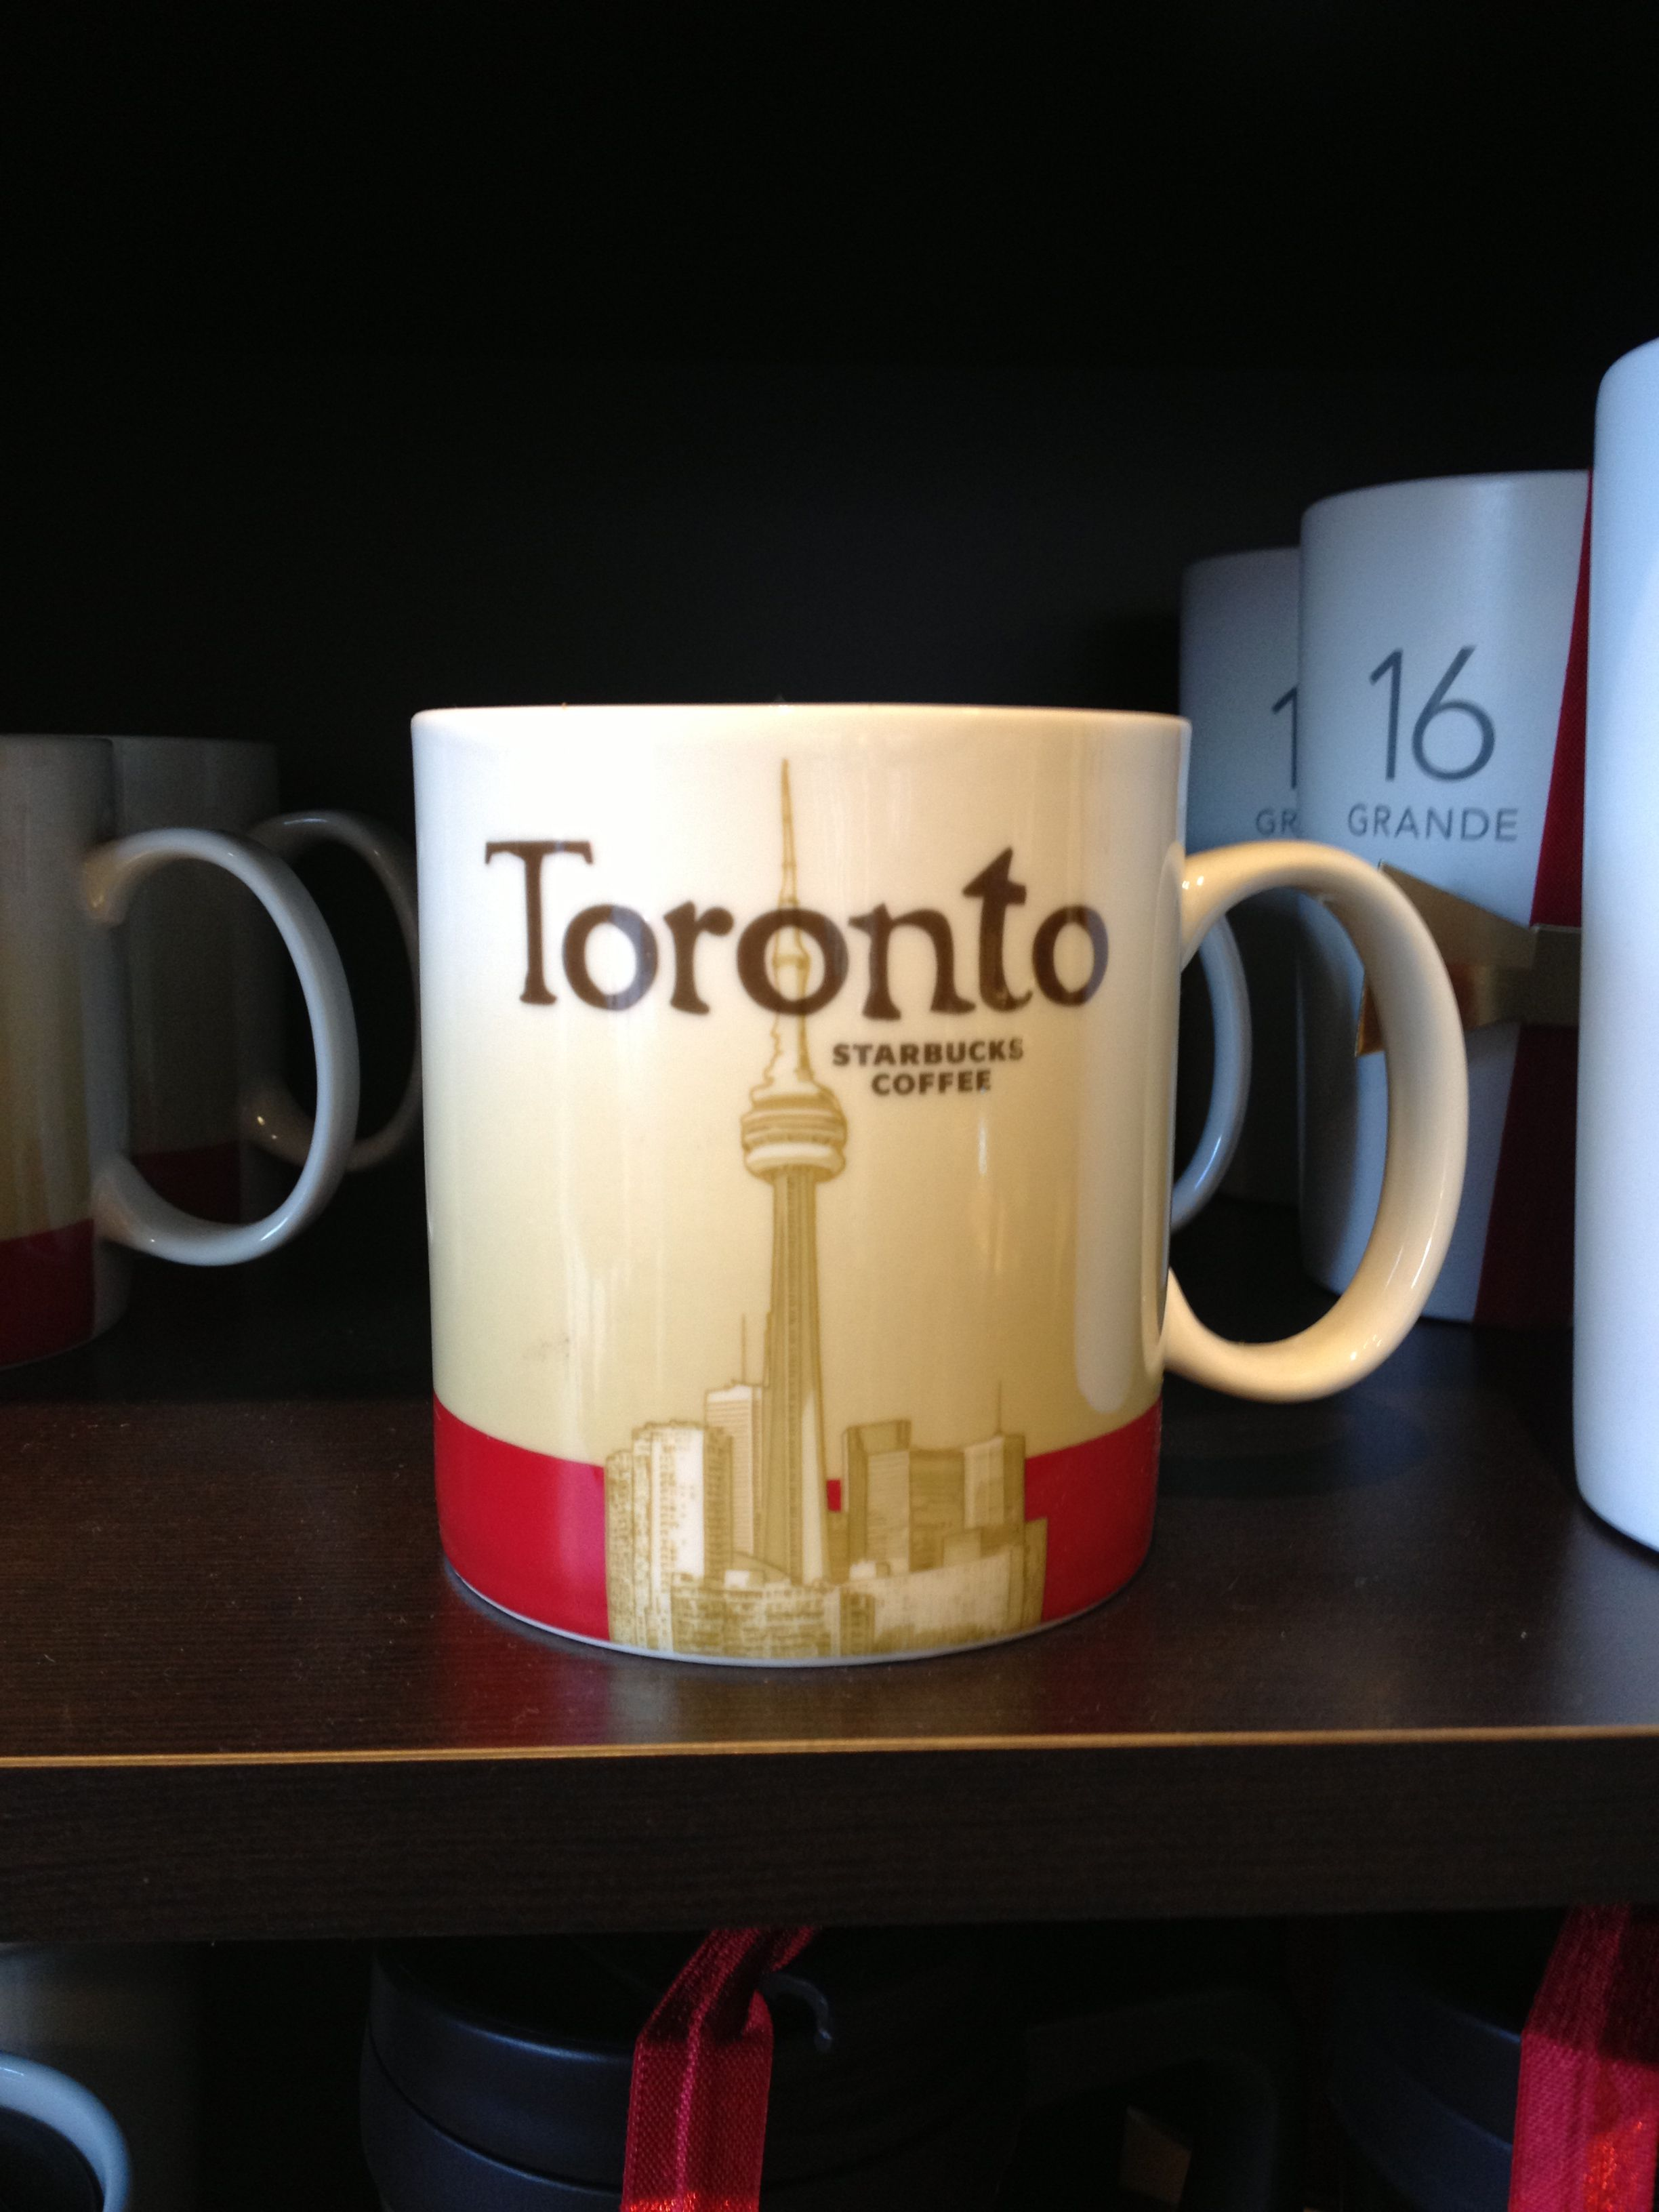 Toronto, Canada. Starbucks coffee, Starbucks, Tableware